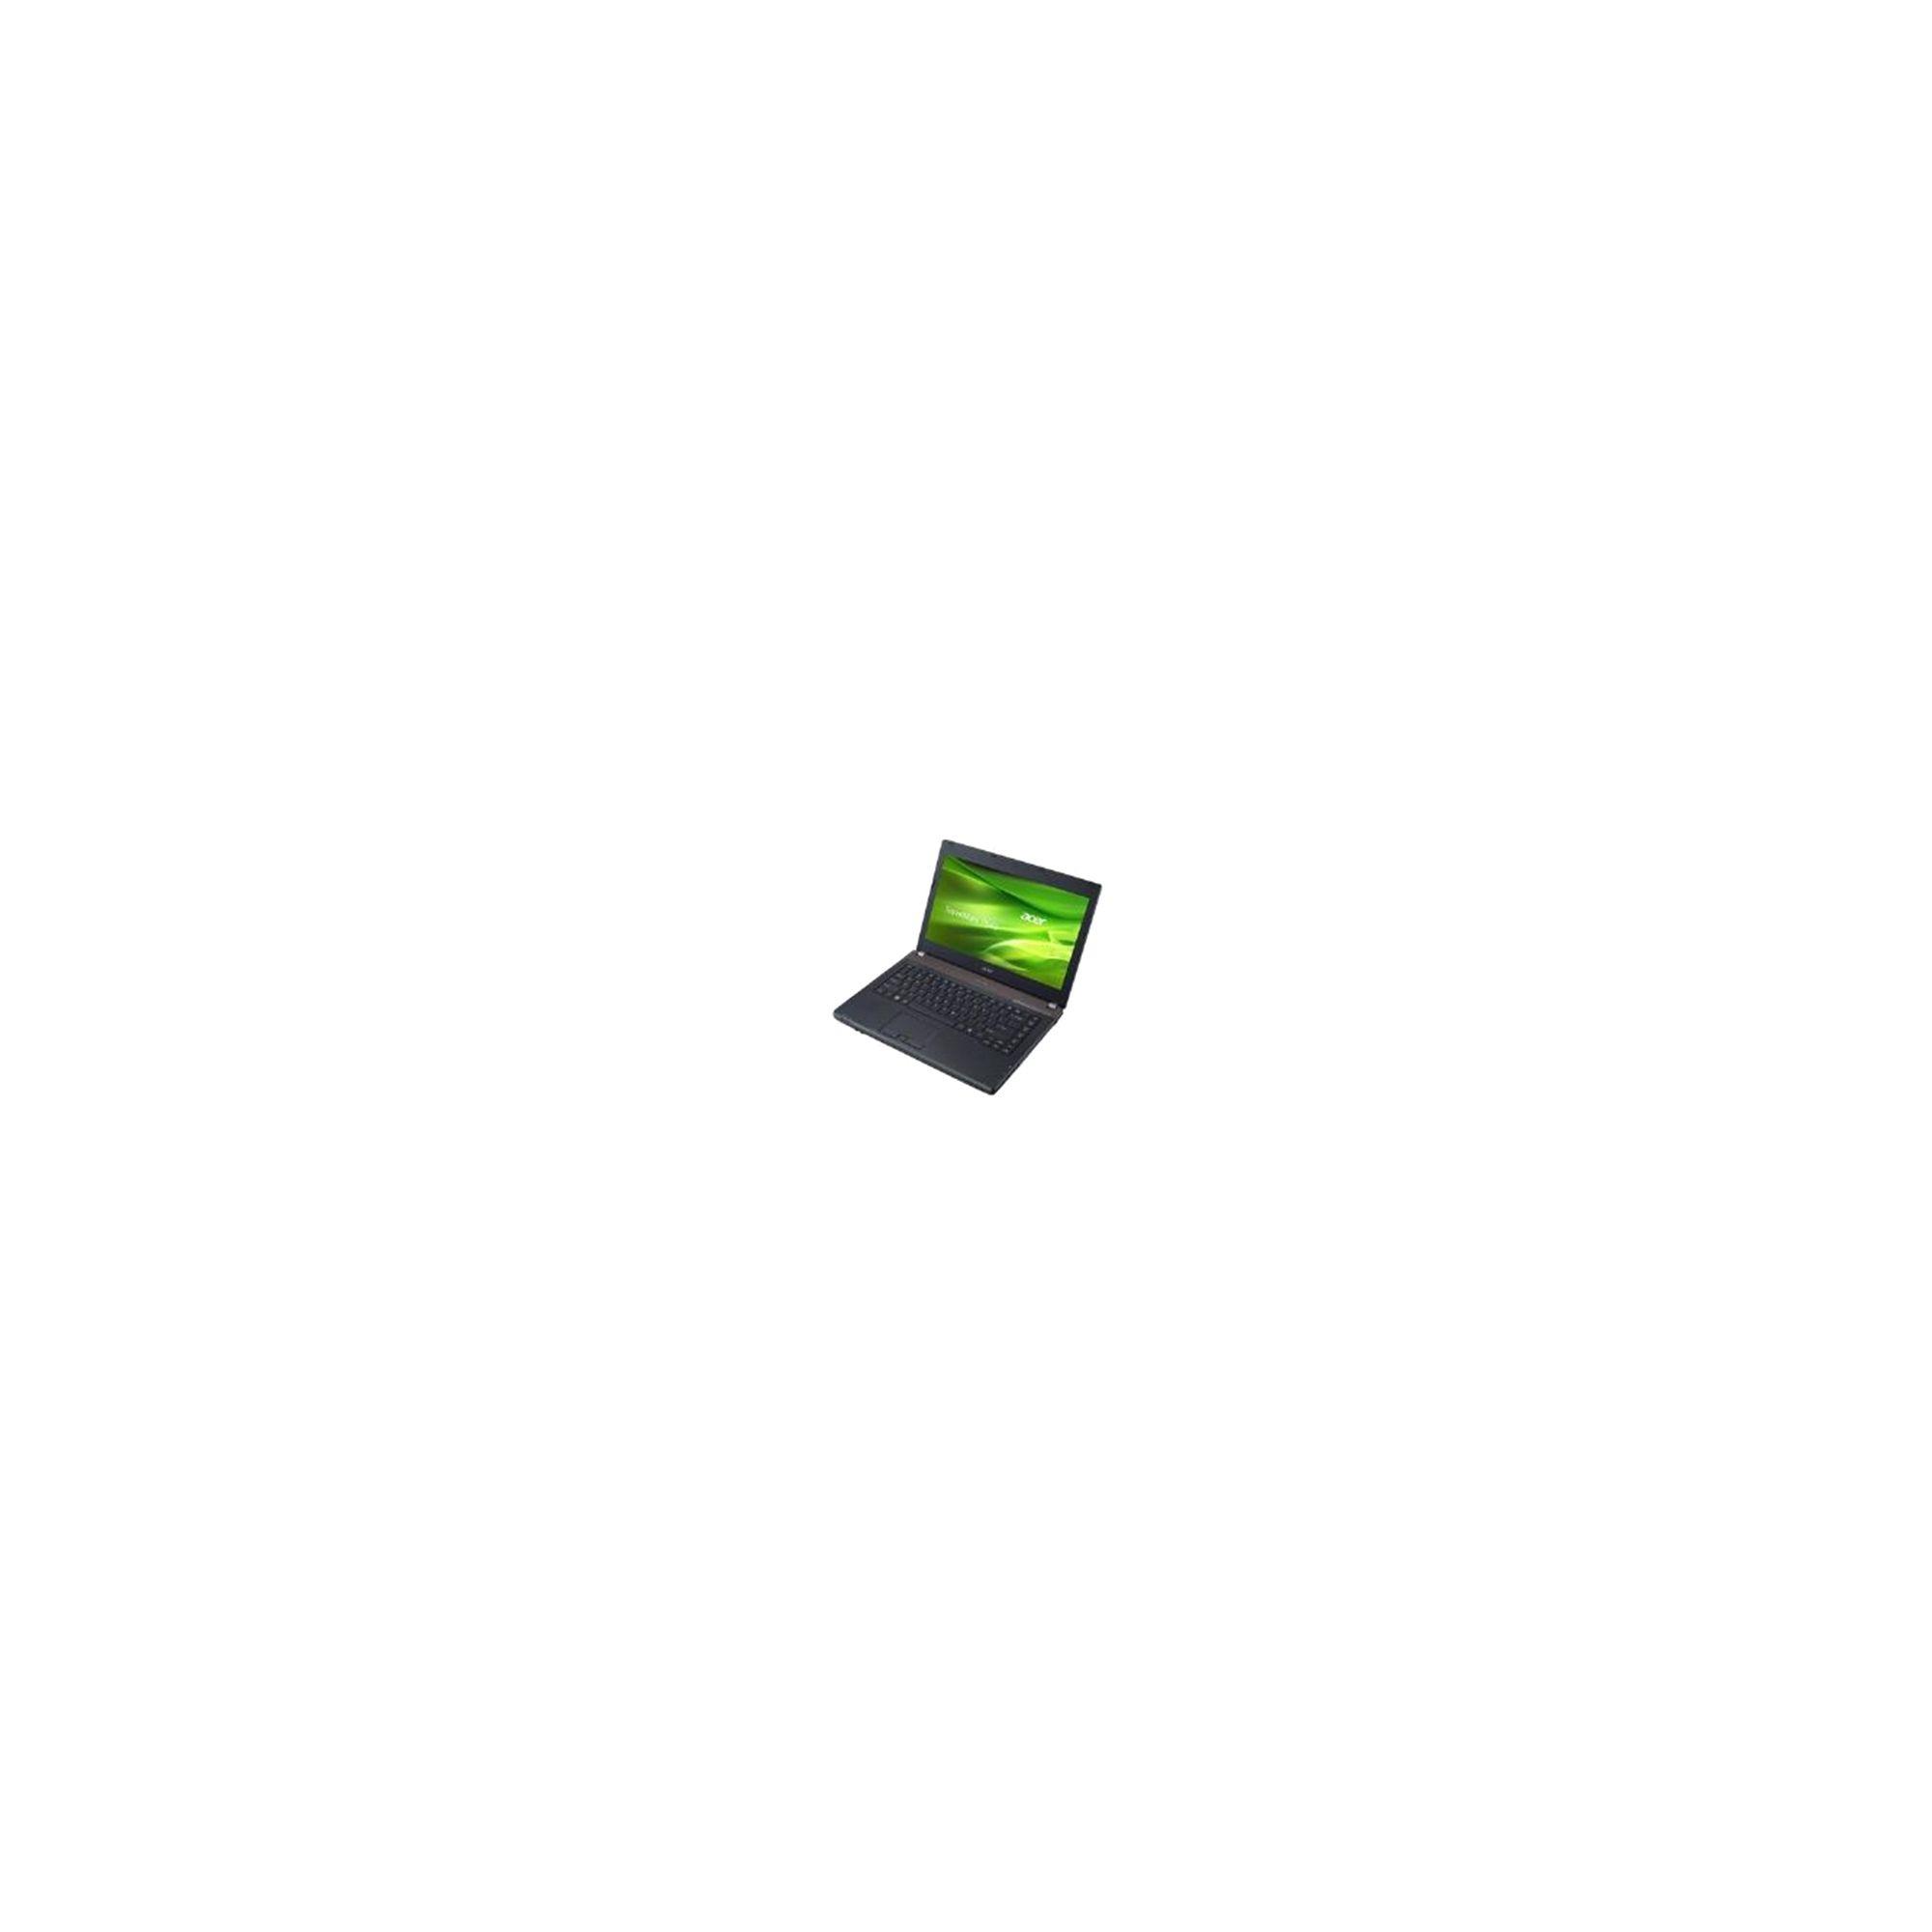 Acer TravelMate TMP643-M-53214G32Mikk (14 inch) Notebook Core i5 (3210M) 2.5GHz 4GB 320GB DVD-SM WLAN BT Webcam Windows 7 Pro 64-bit/32-bit Dual Load at Tesco Direct